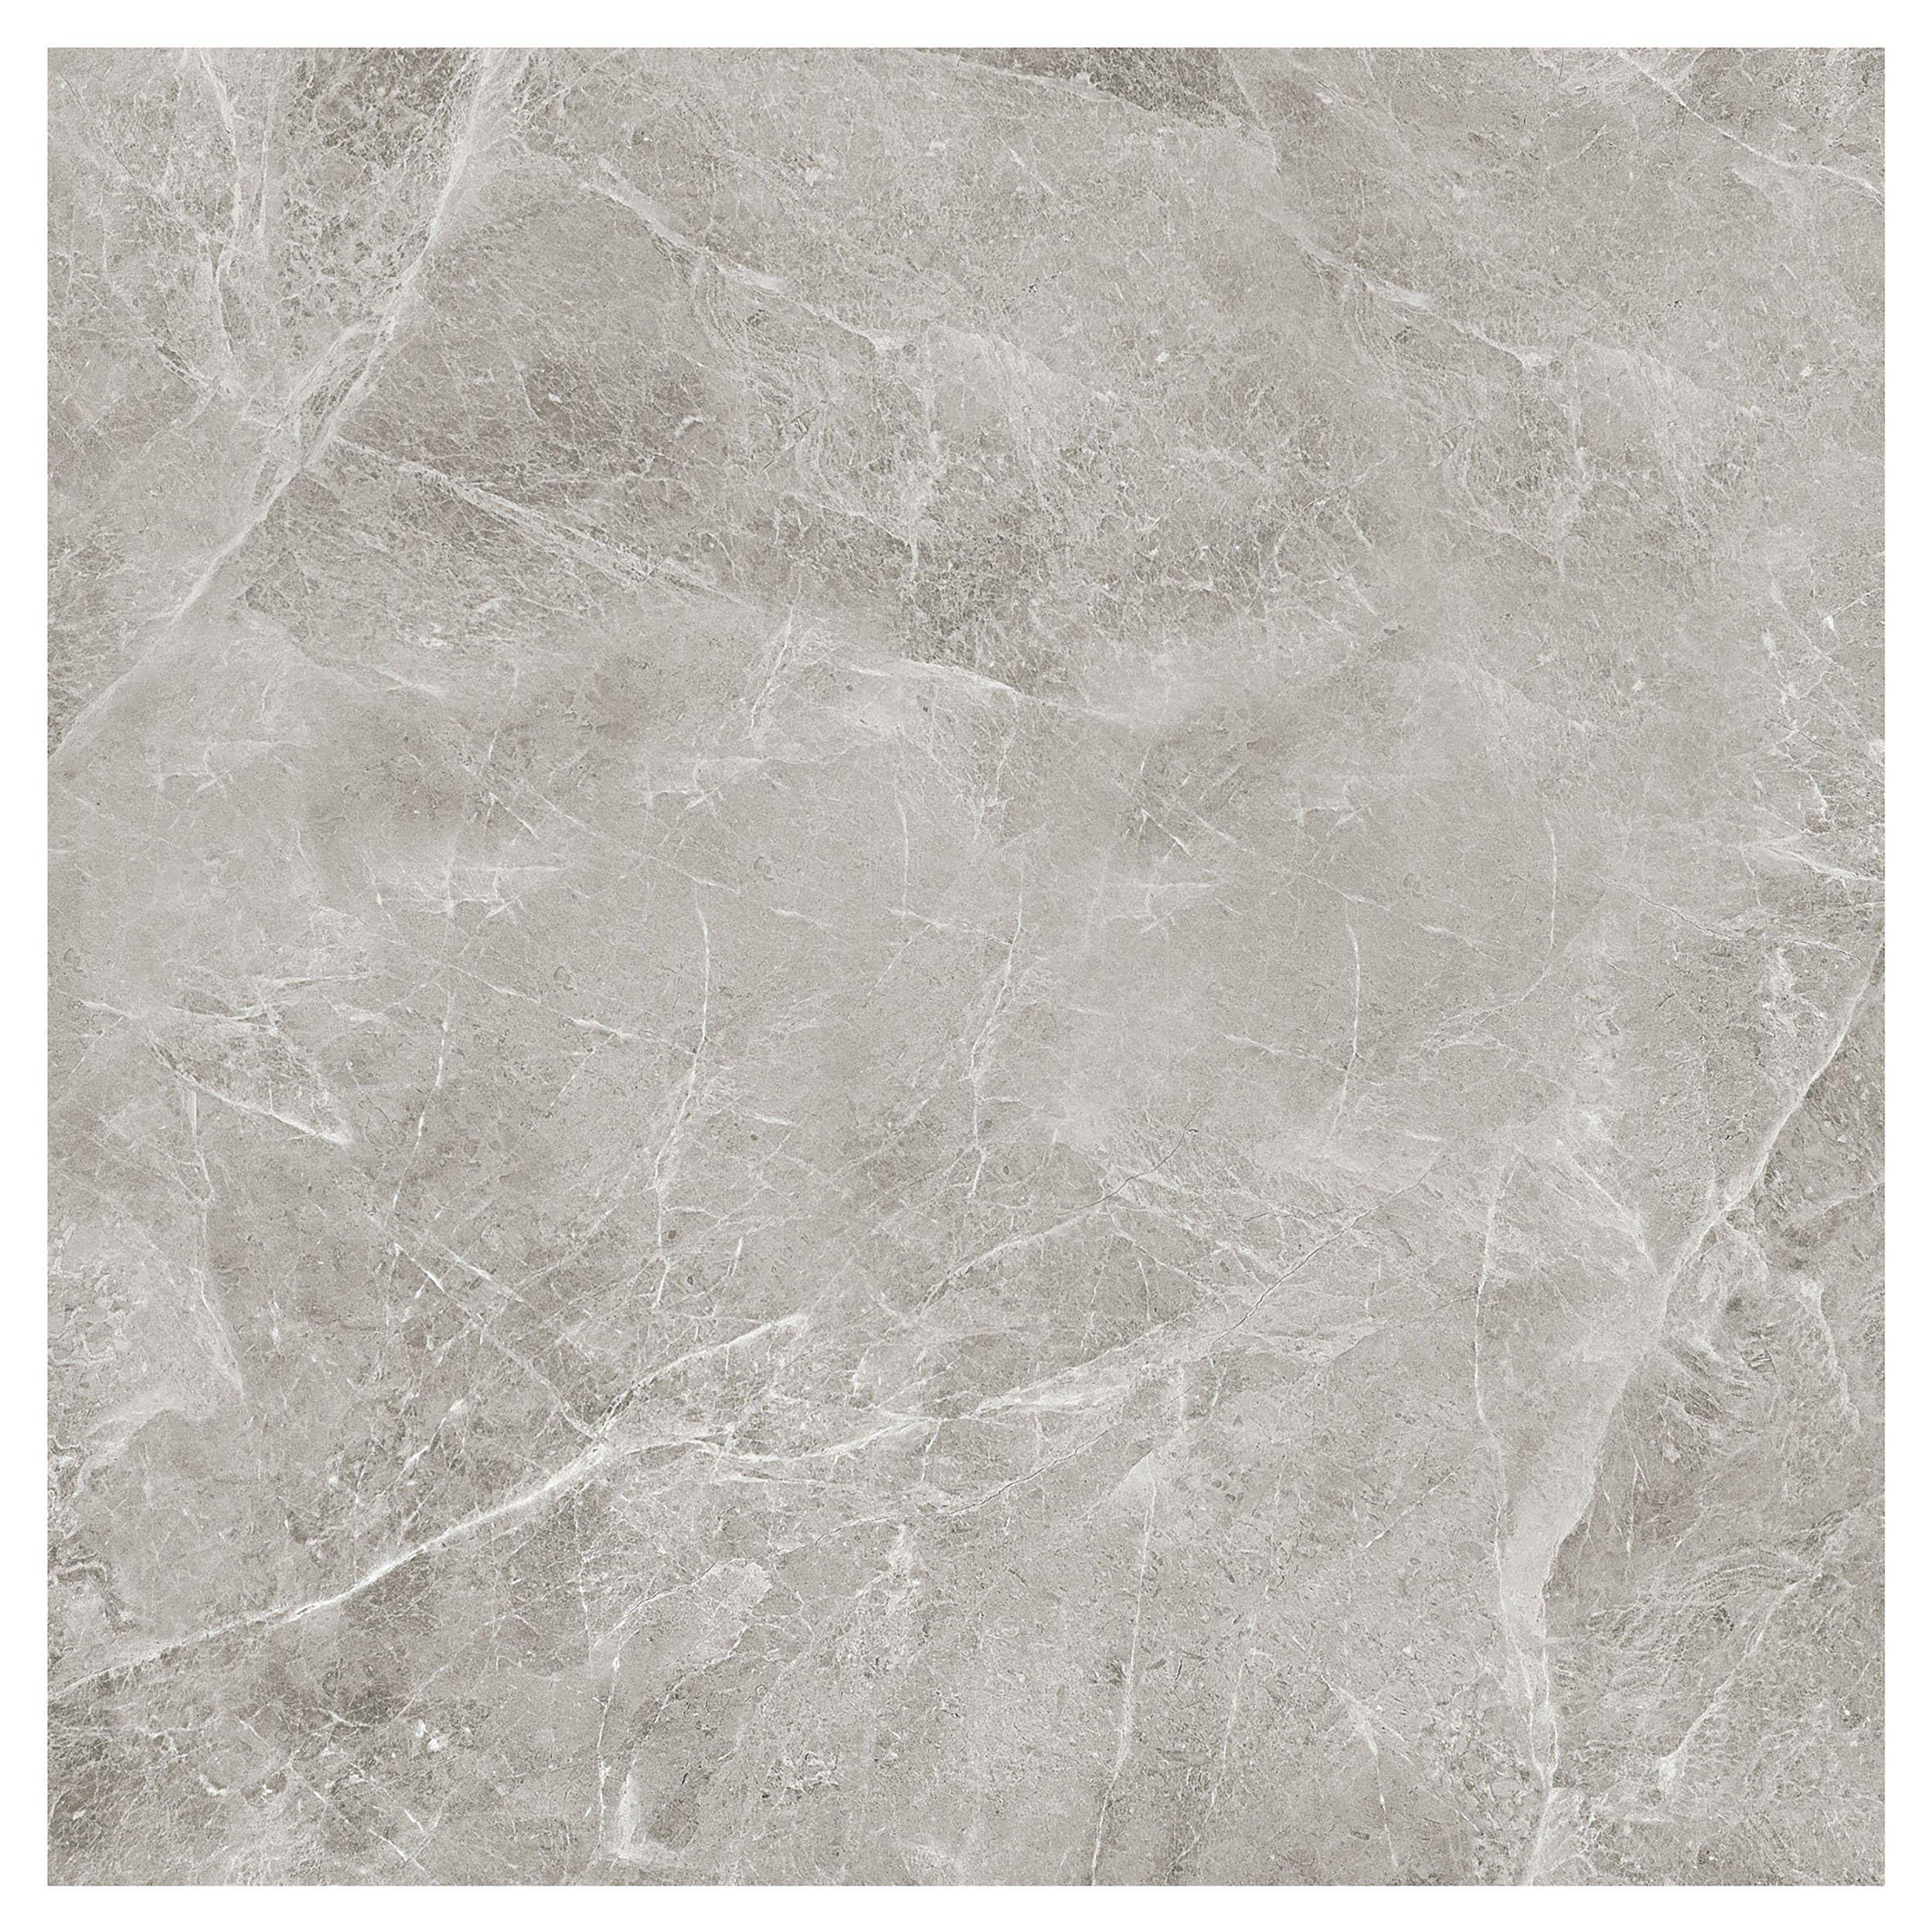 Sequioa Linear Glass And Metal Mosaic Floor Decor Polished Porcelain Tiles Grey Polished Porcelain Tiles Gray Porcelain Tile